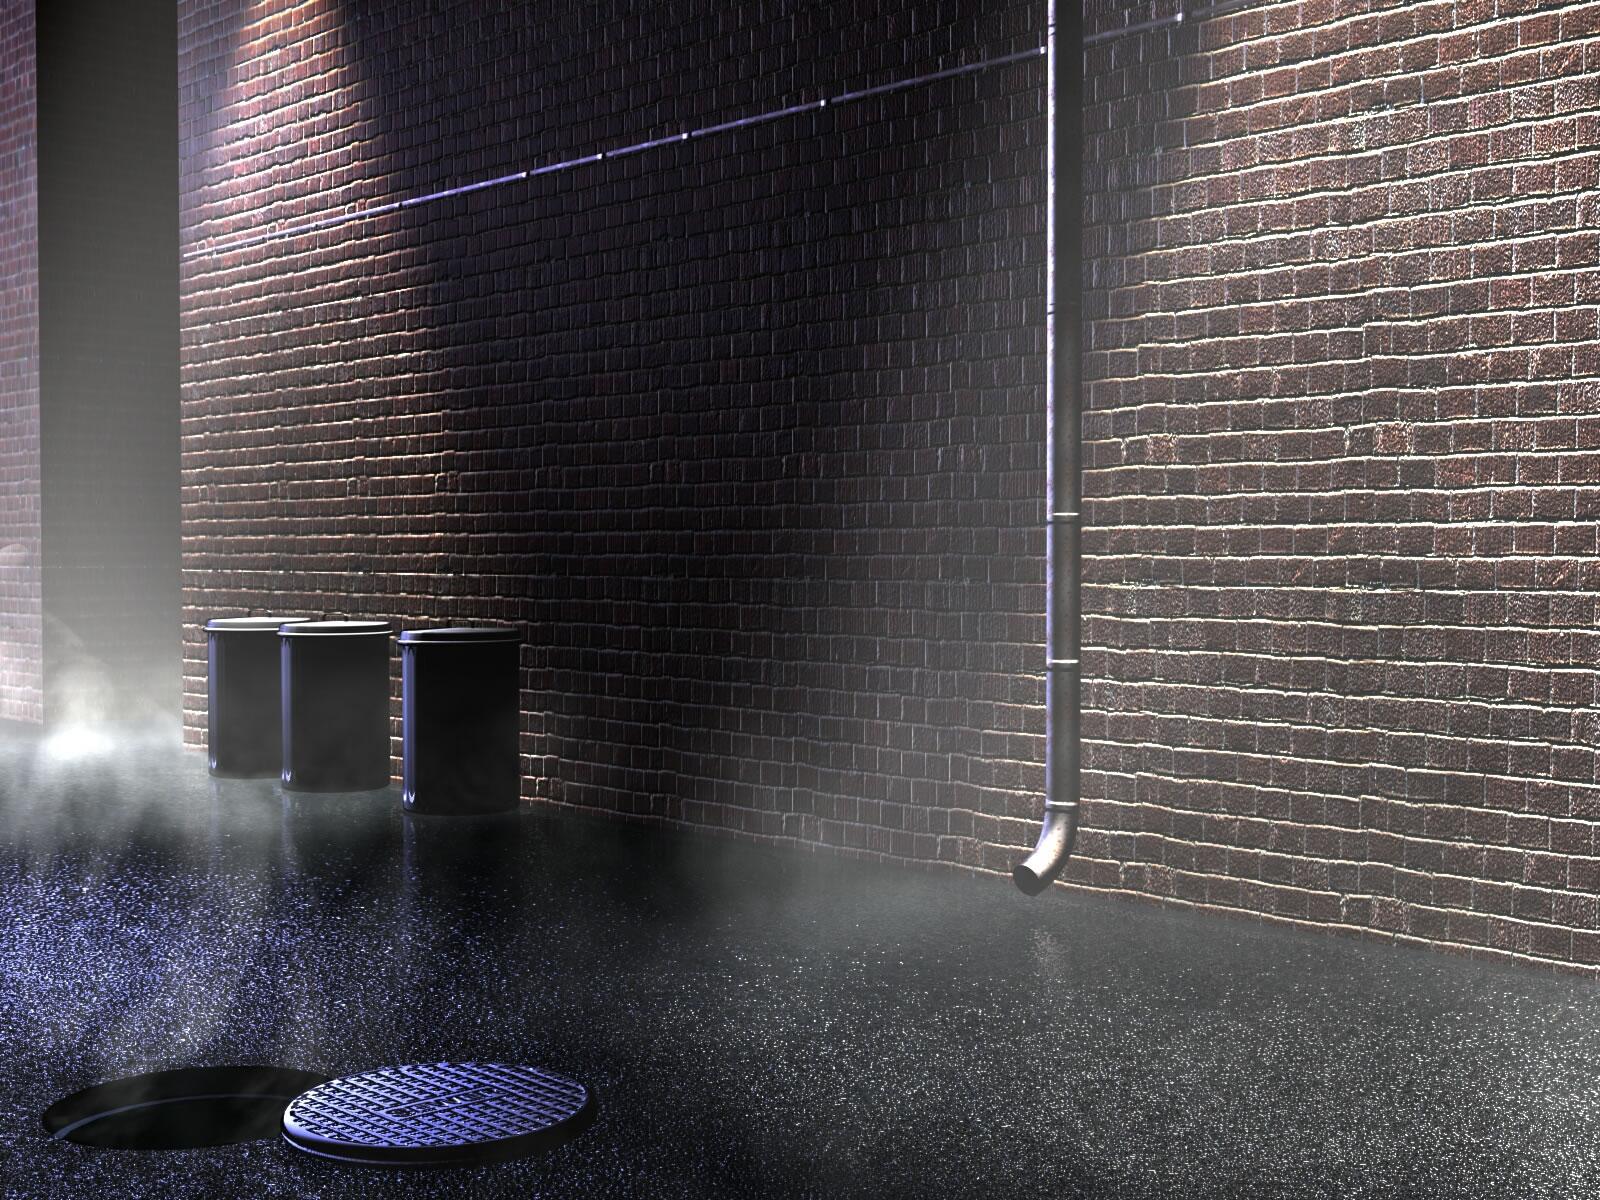 Brickwall Bin Drain   Abstract Wallpaper 1600x1200